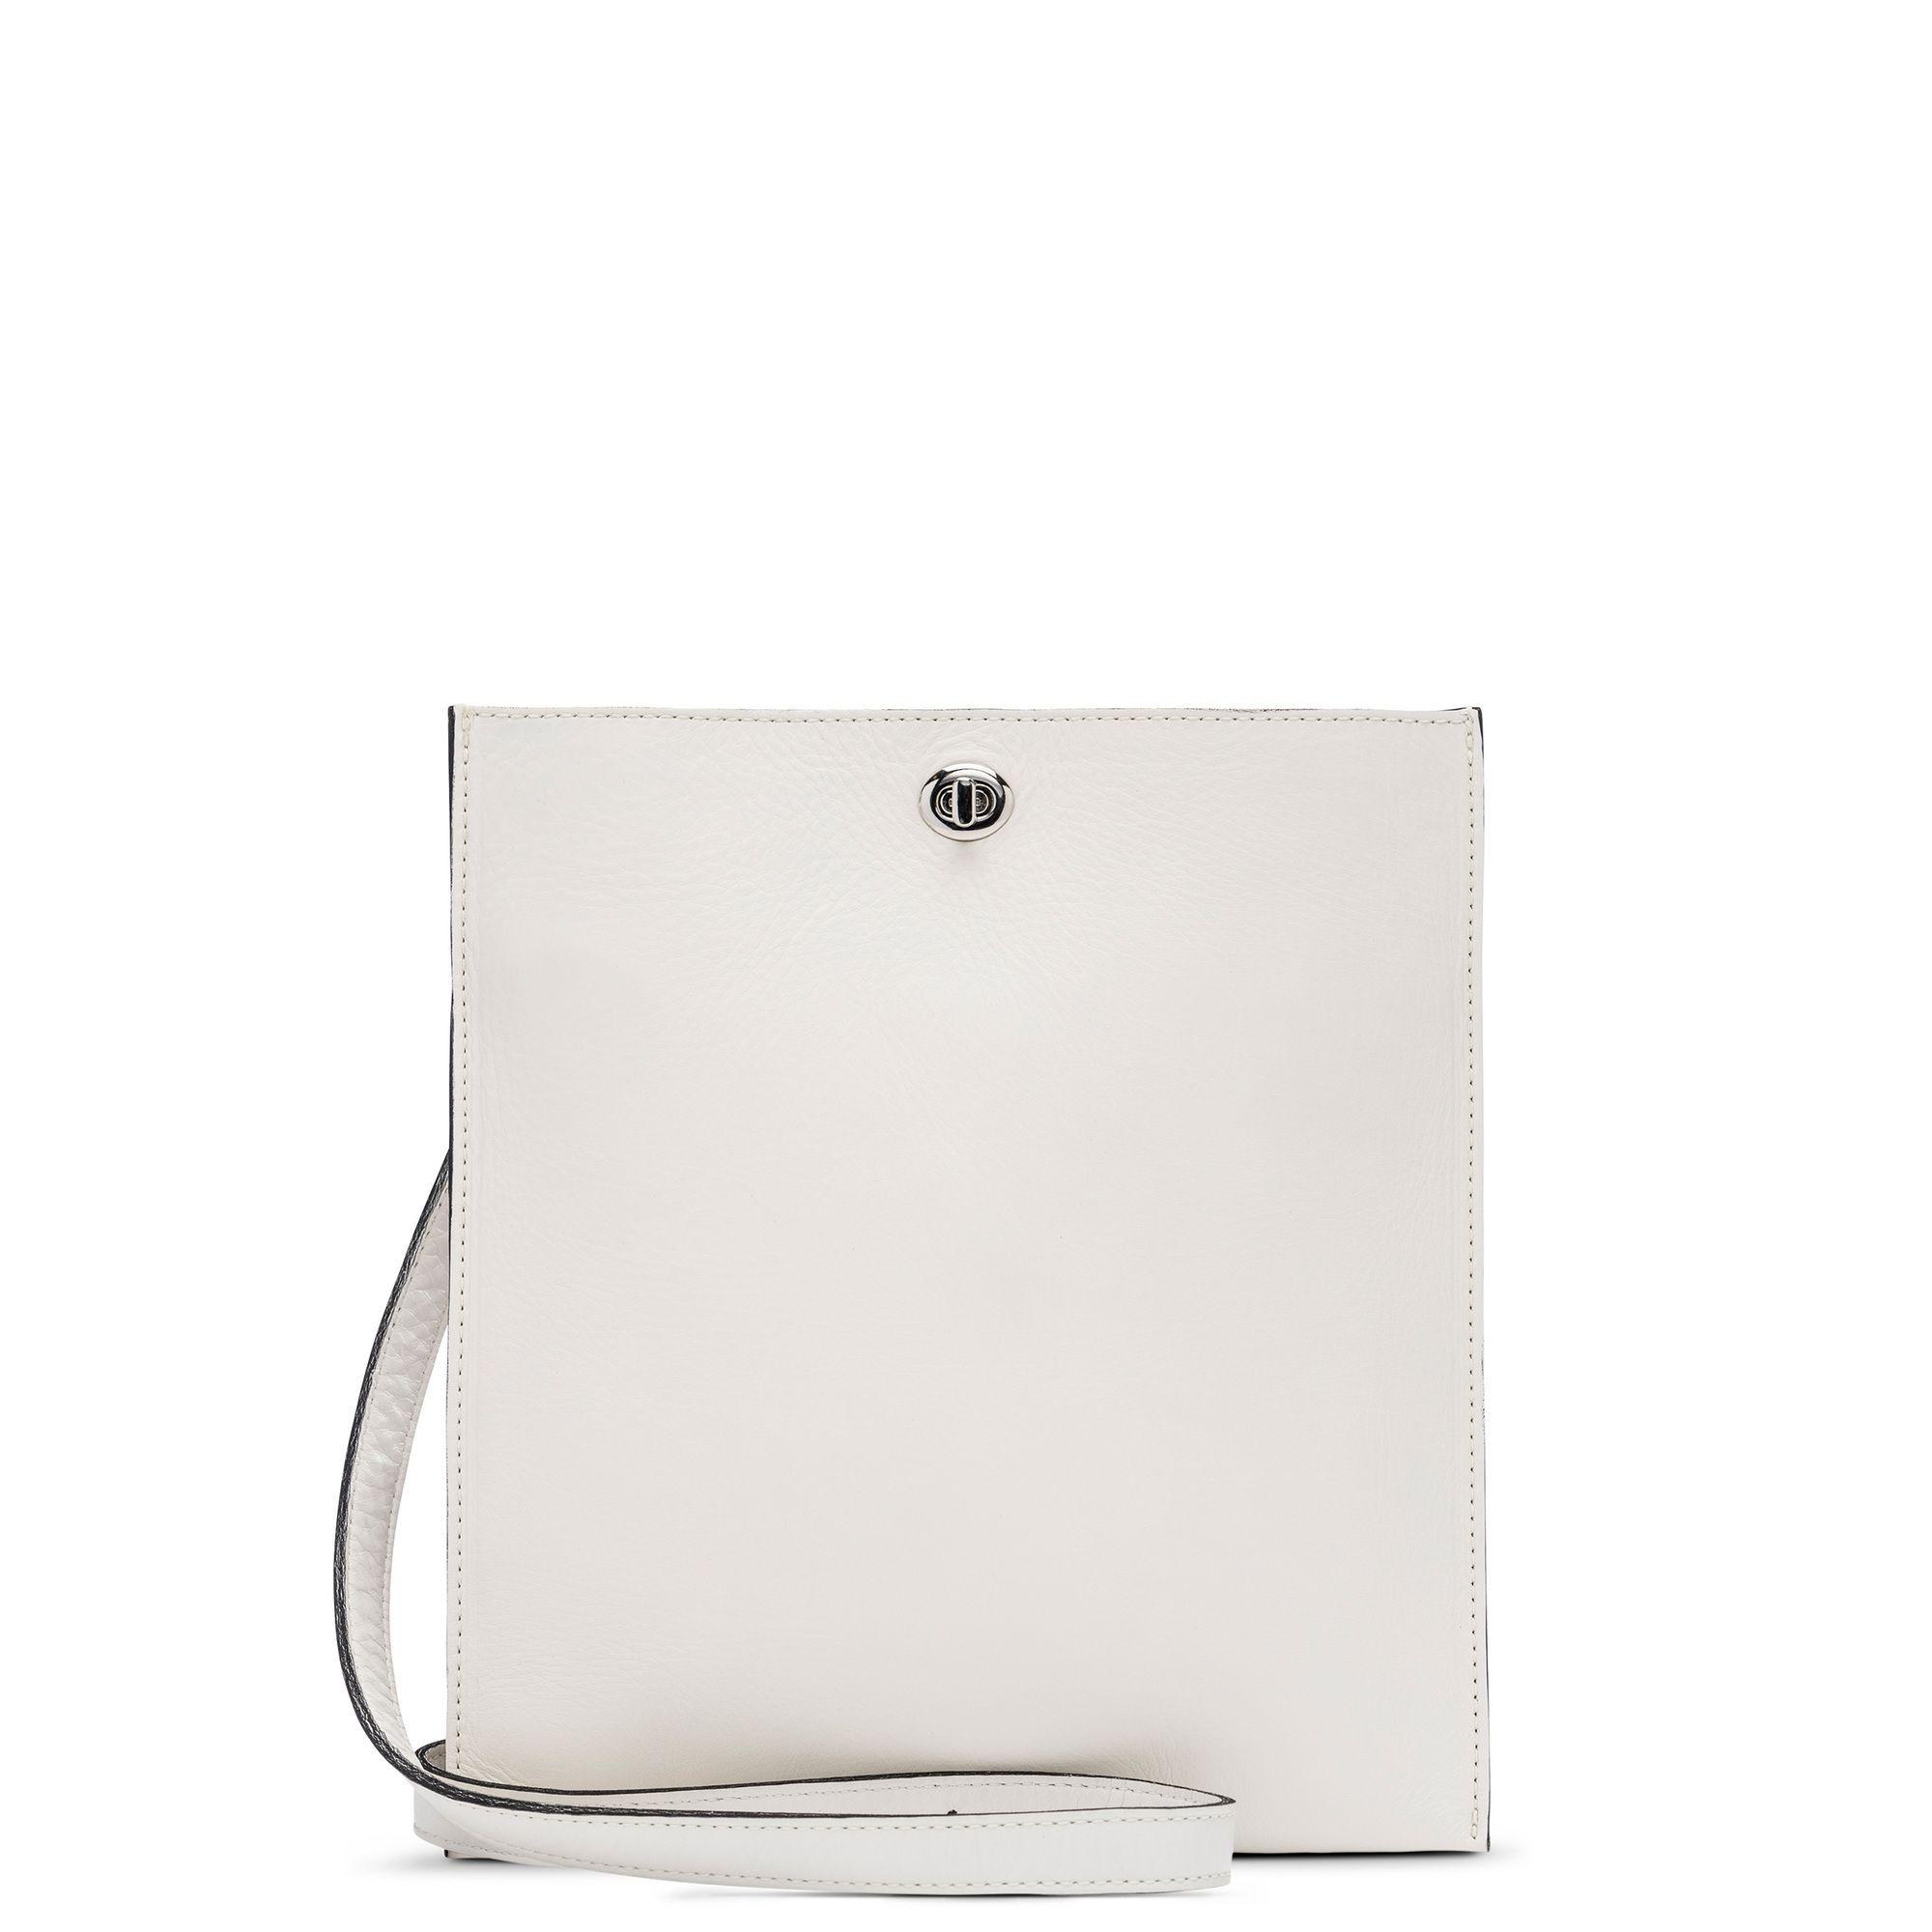 1592f1dbdea0 FL 65. m0851. Off White. Leather. Flat Bag. | Fashion Inspiration ...